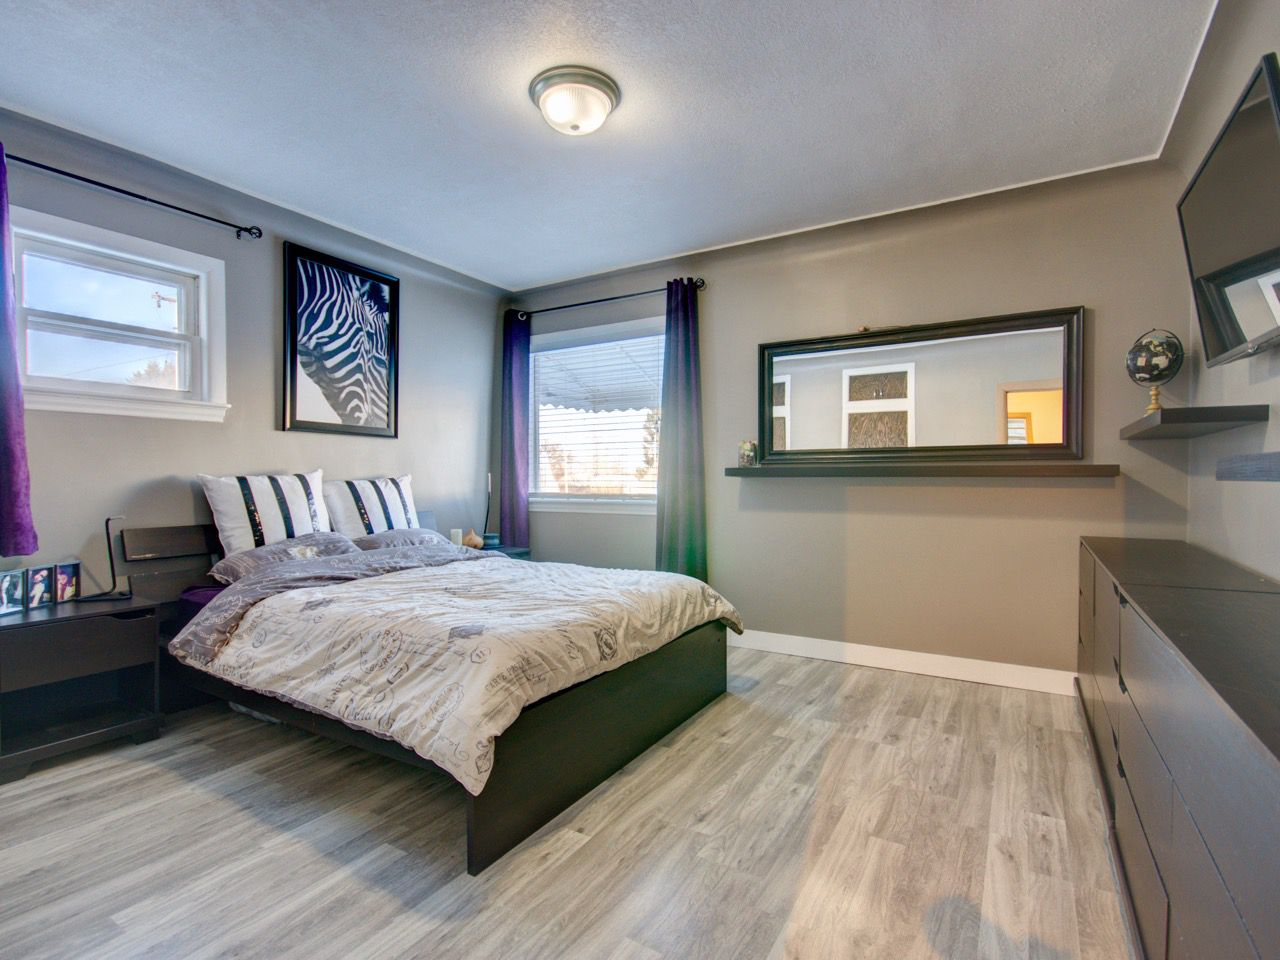 Main Photo: 5102 48 Street: Andrew House for sale : MLS®# E4146293